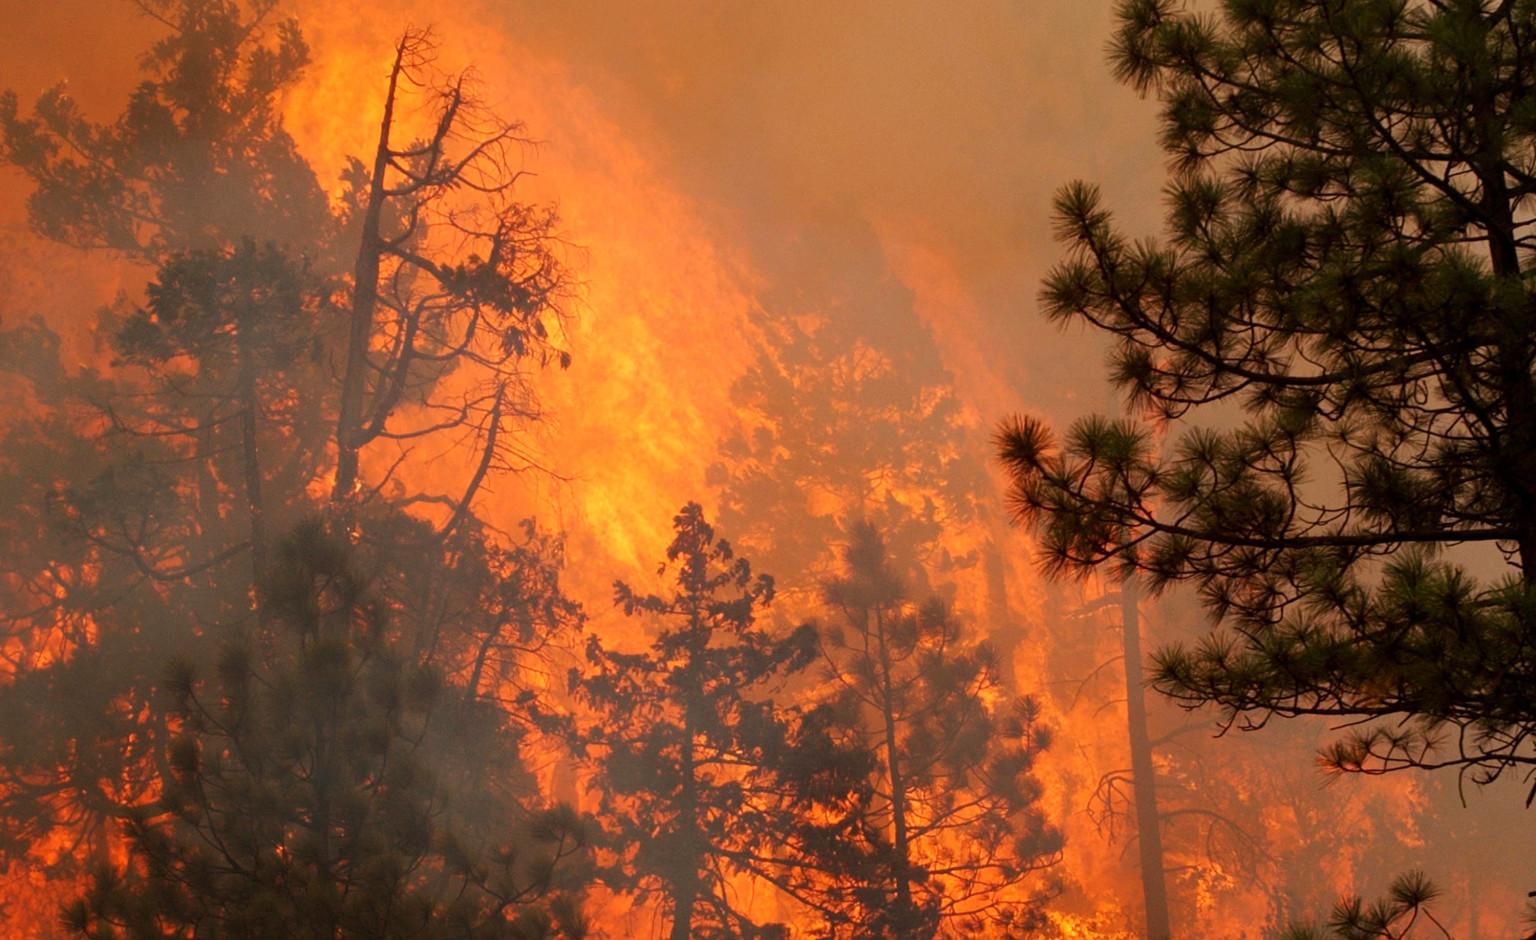 john hammack killed while battling oregon wildfire  another firefighter injured